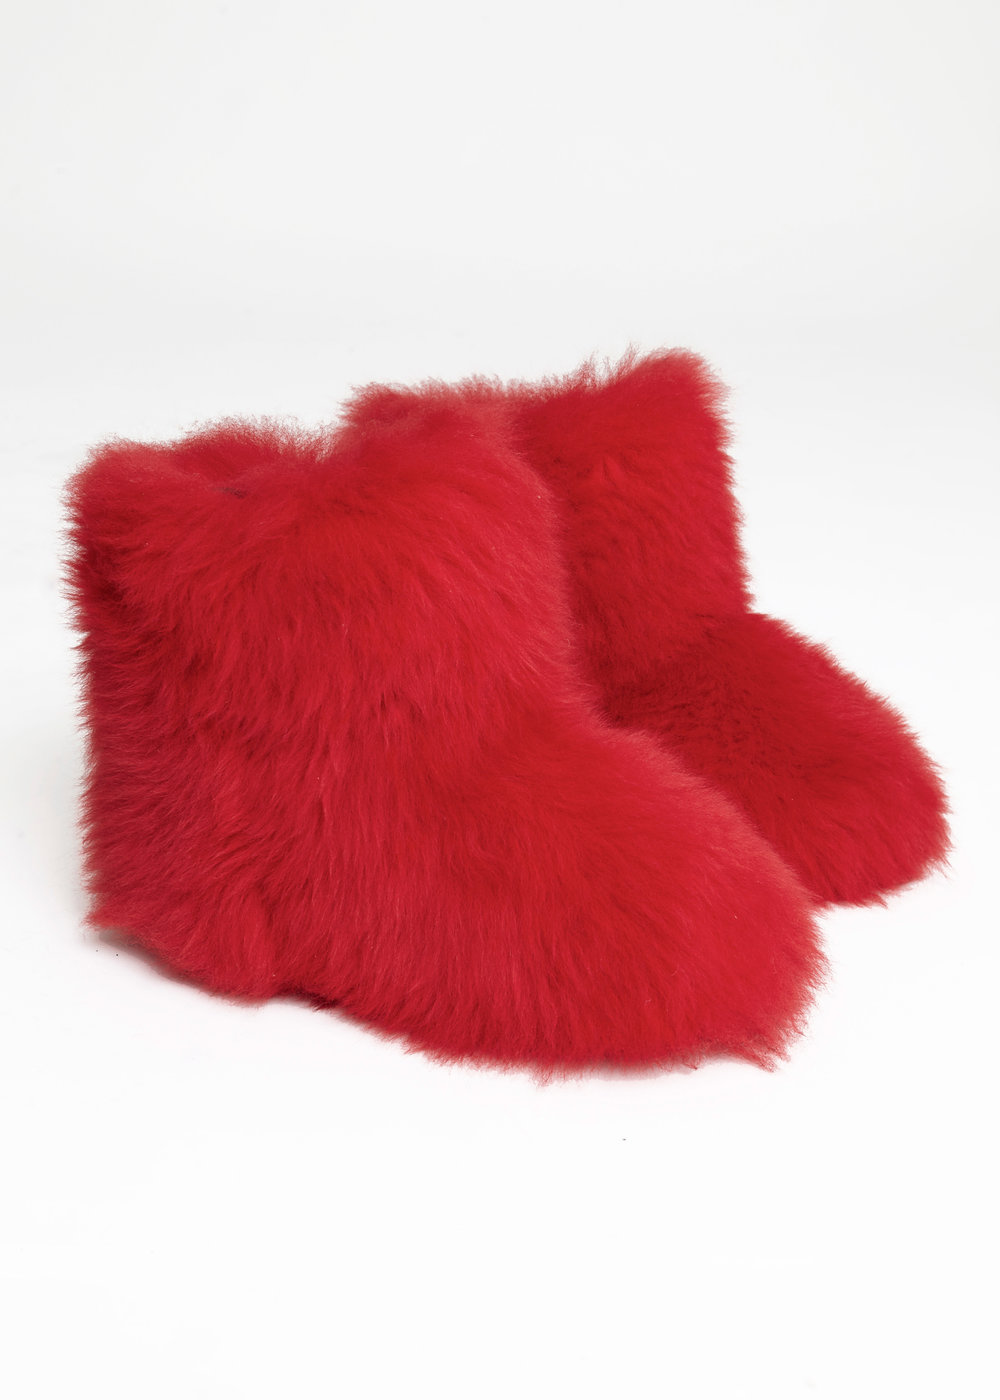 RED EX-UGG LONG HAIR MERINO SNOW BOOT